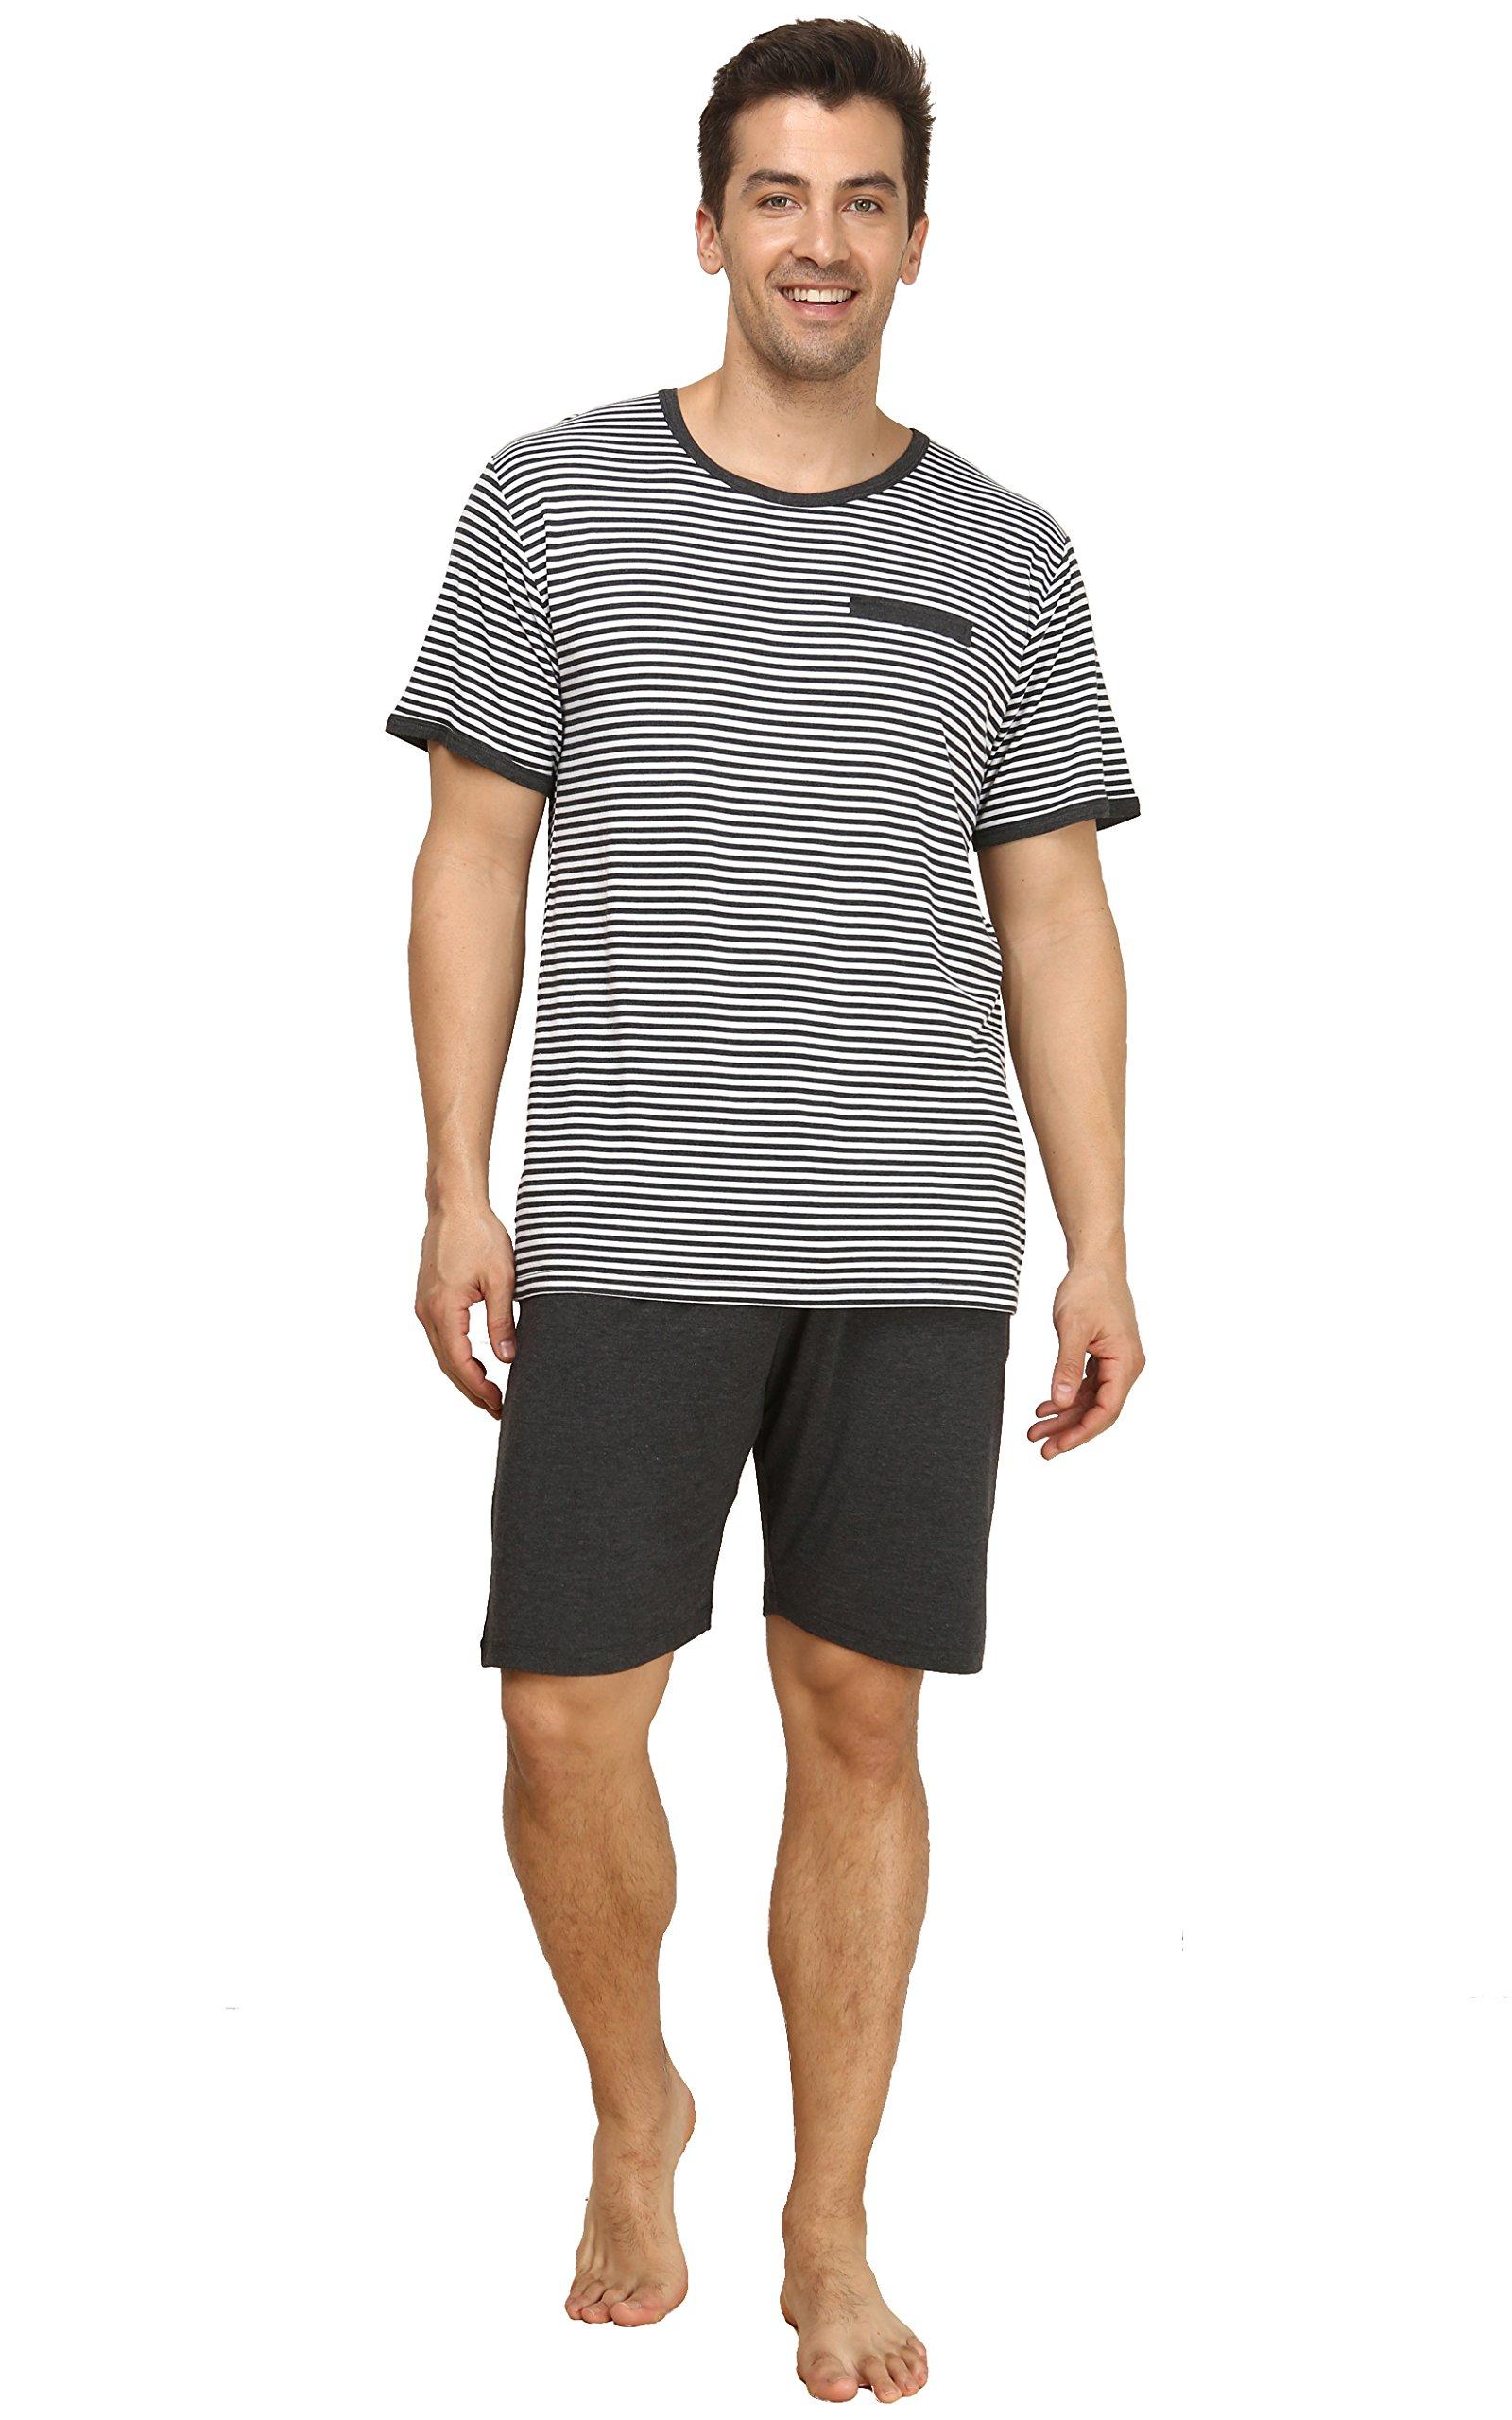 Suntasty Men's Summer Sleepwear Striped Short Sleeve Pajama Shorts and Top Set(Grey,S,1004M)